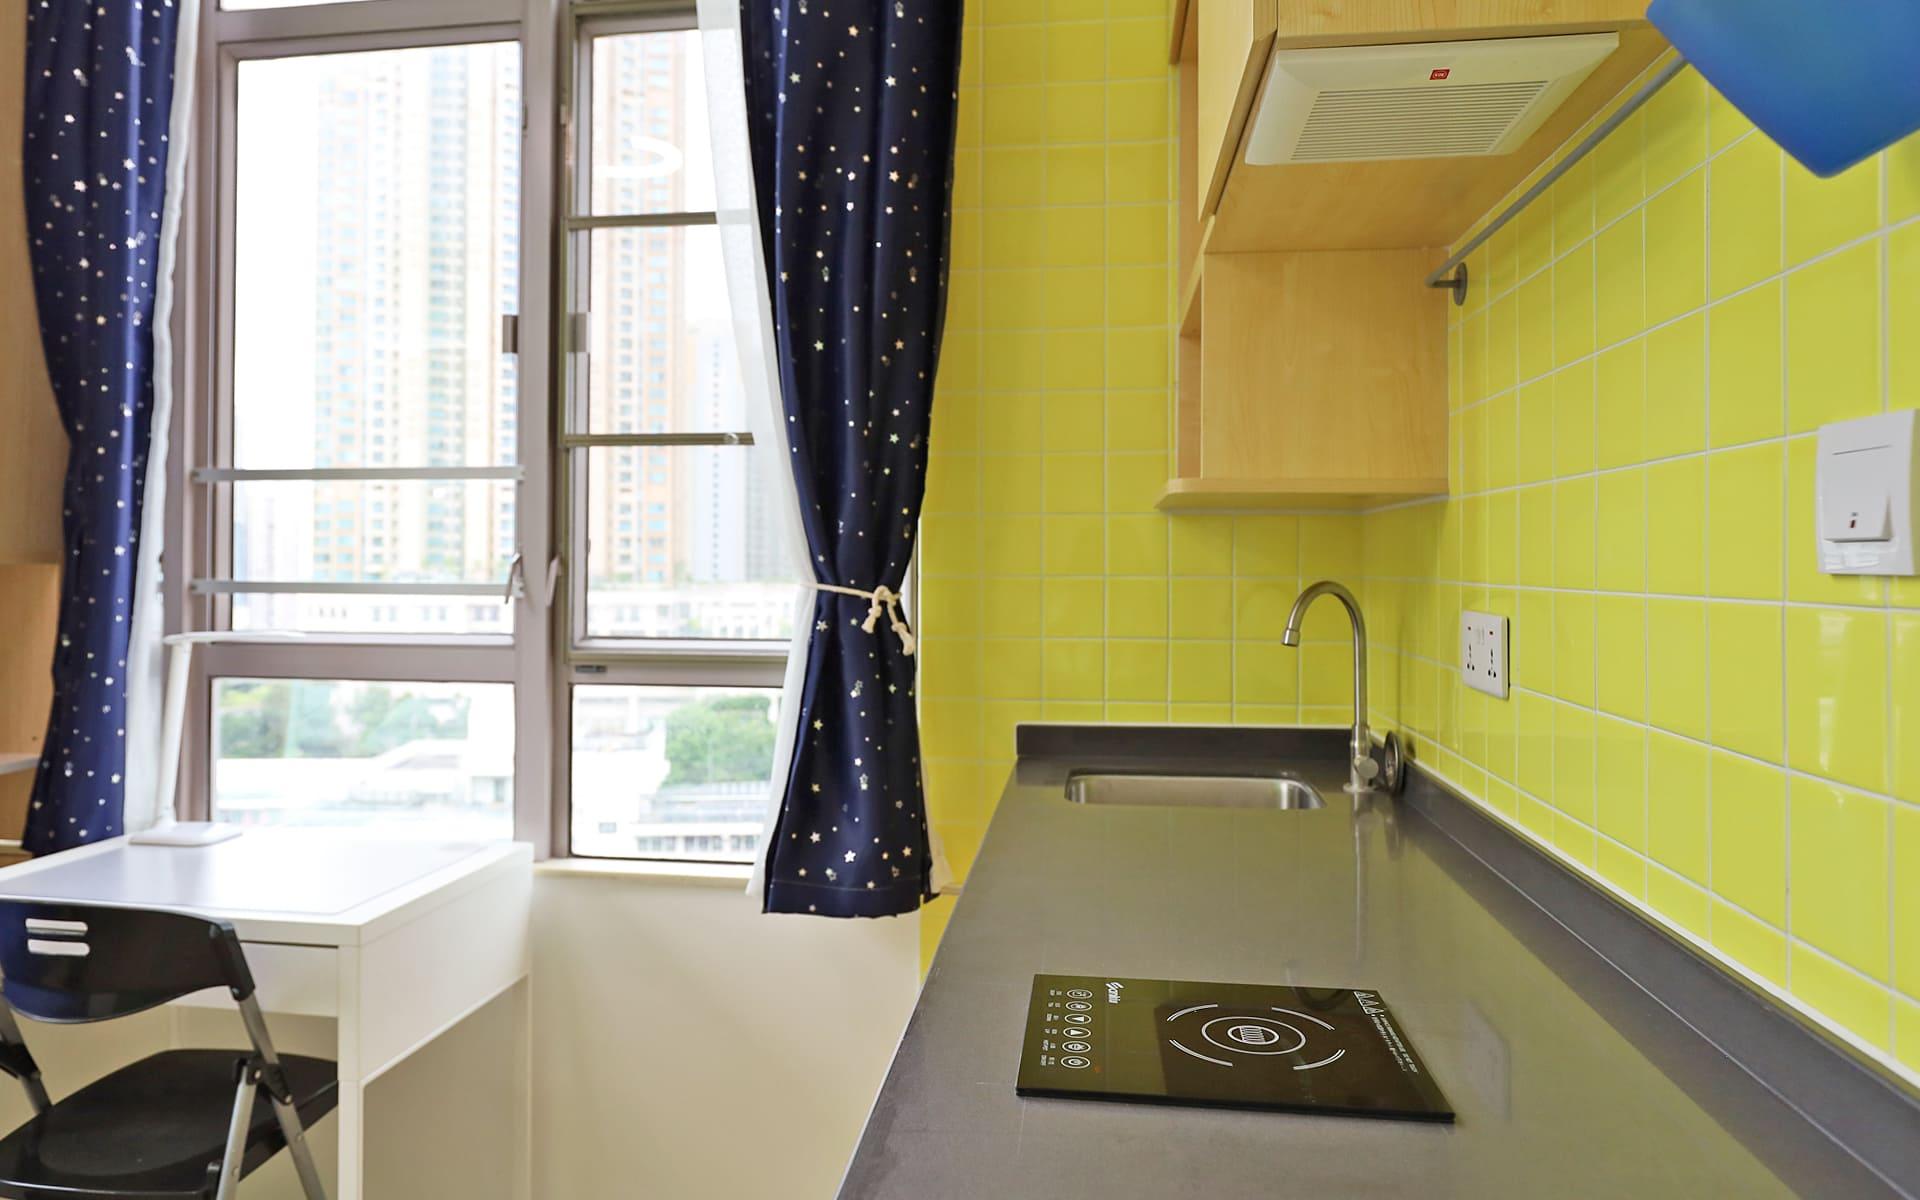 hk_service_apartment_8099870401596694740.jpg